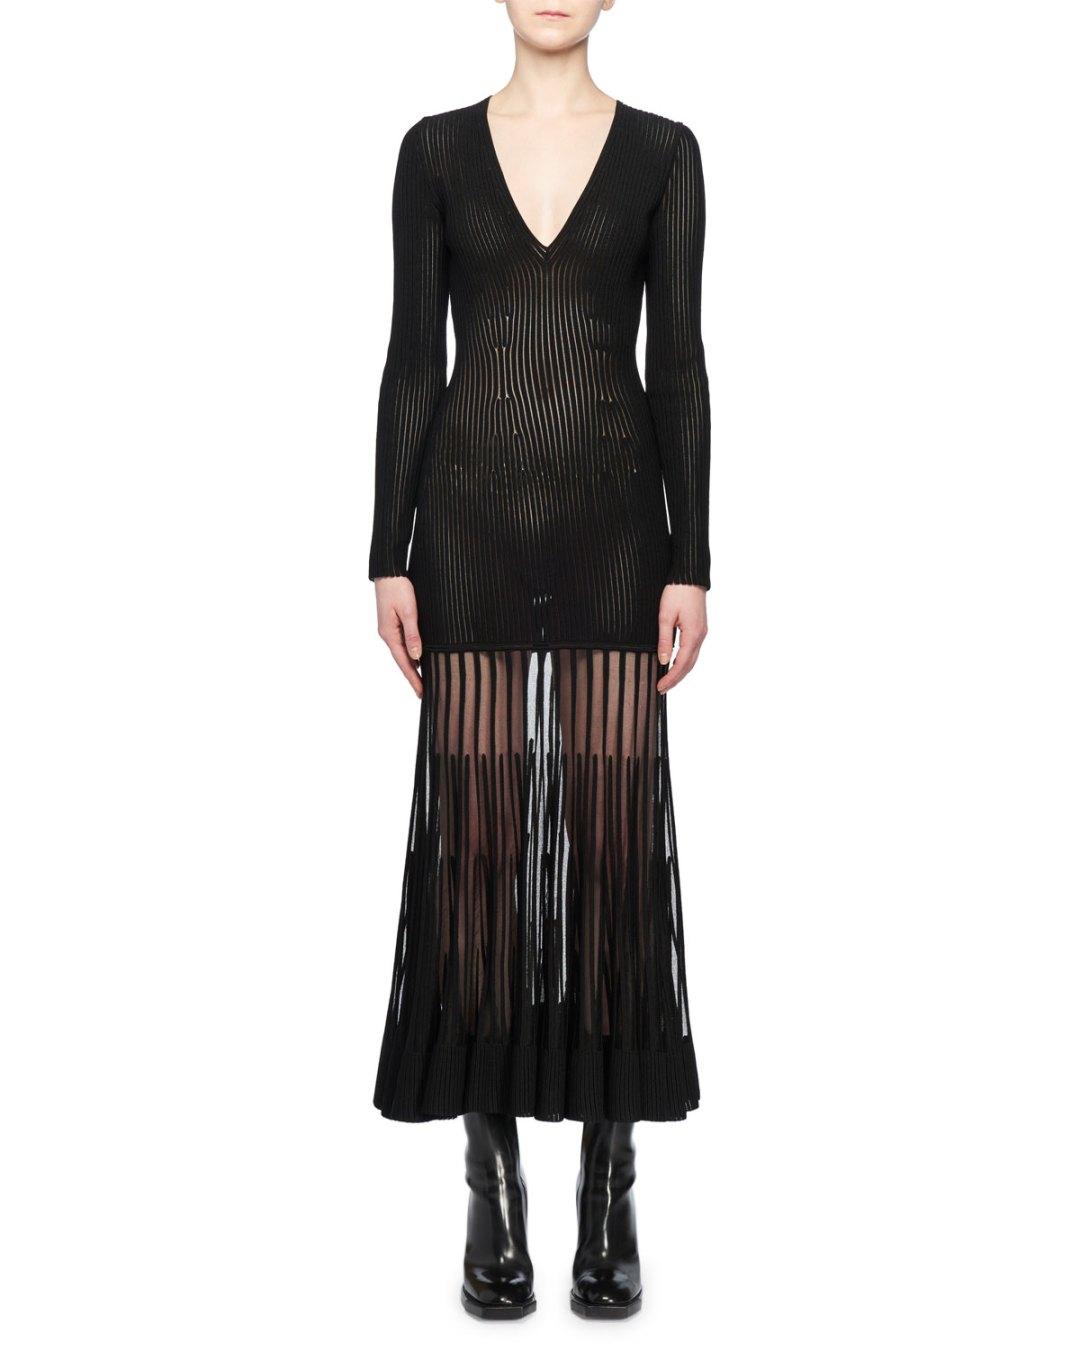 fd50f7c314ed3 ALEXANDER McQUEEN – V-Neck Long-Sleeve Ribbed Sheer Bottom Maxi Dress –  Bergdorf Goodman (Neiman Marcus) –  3